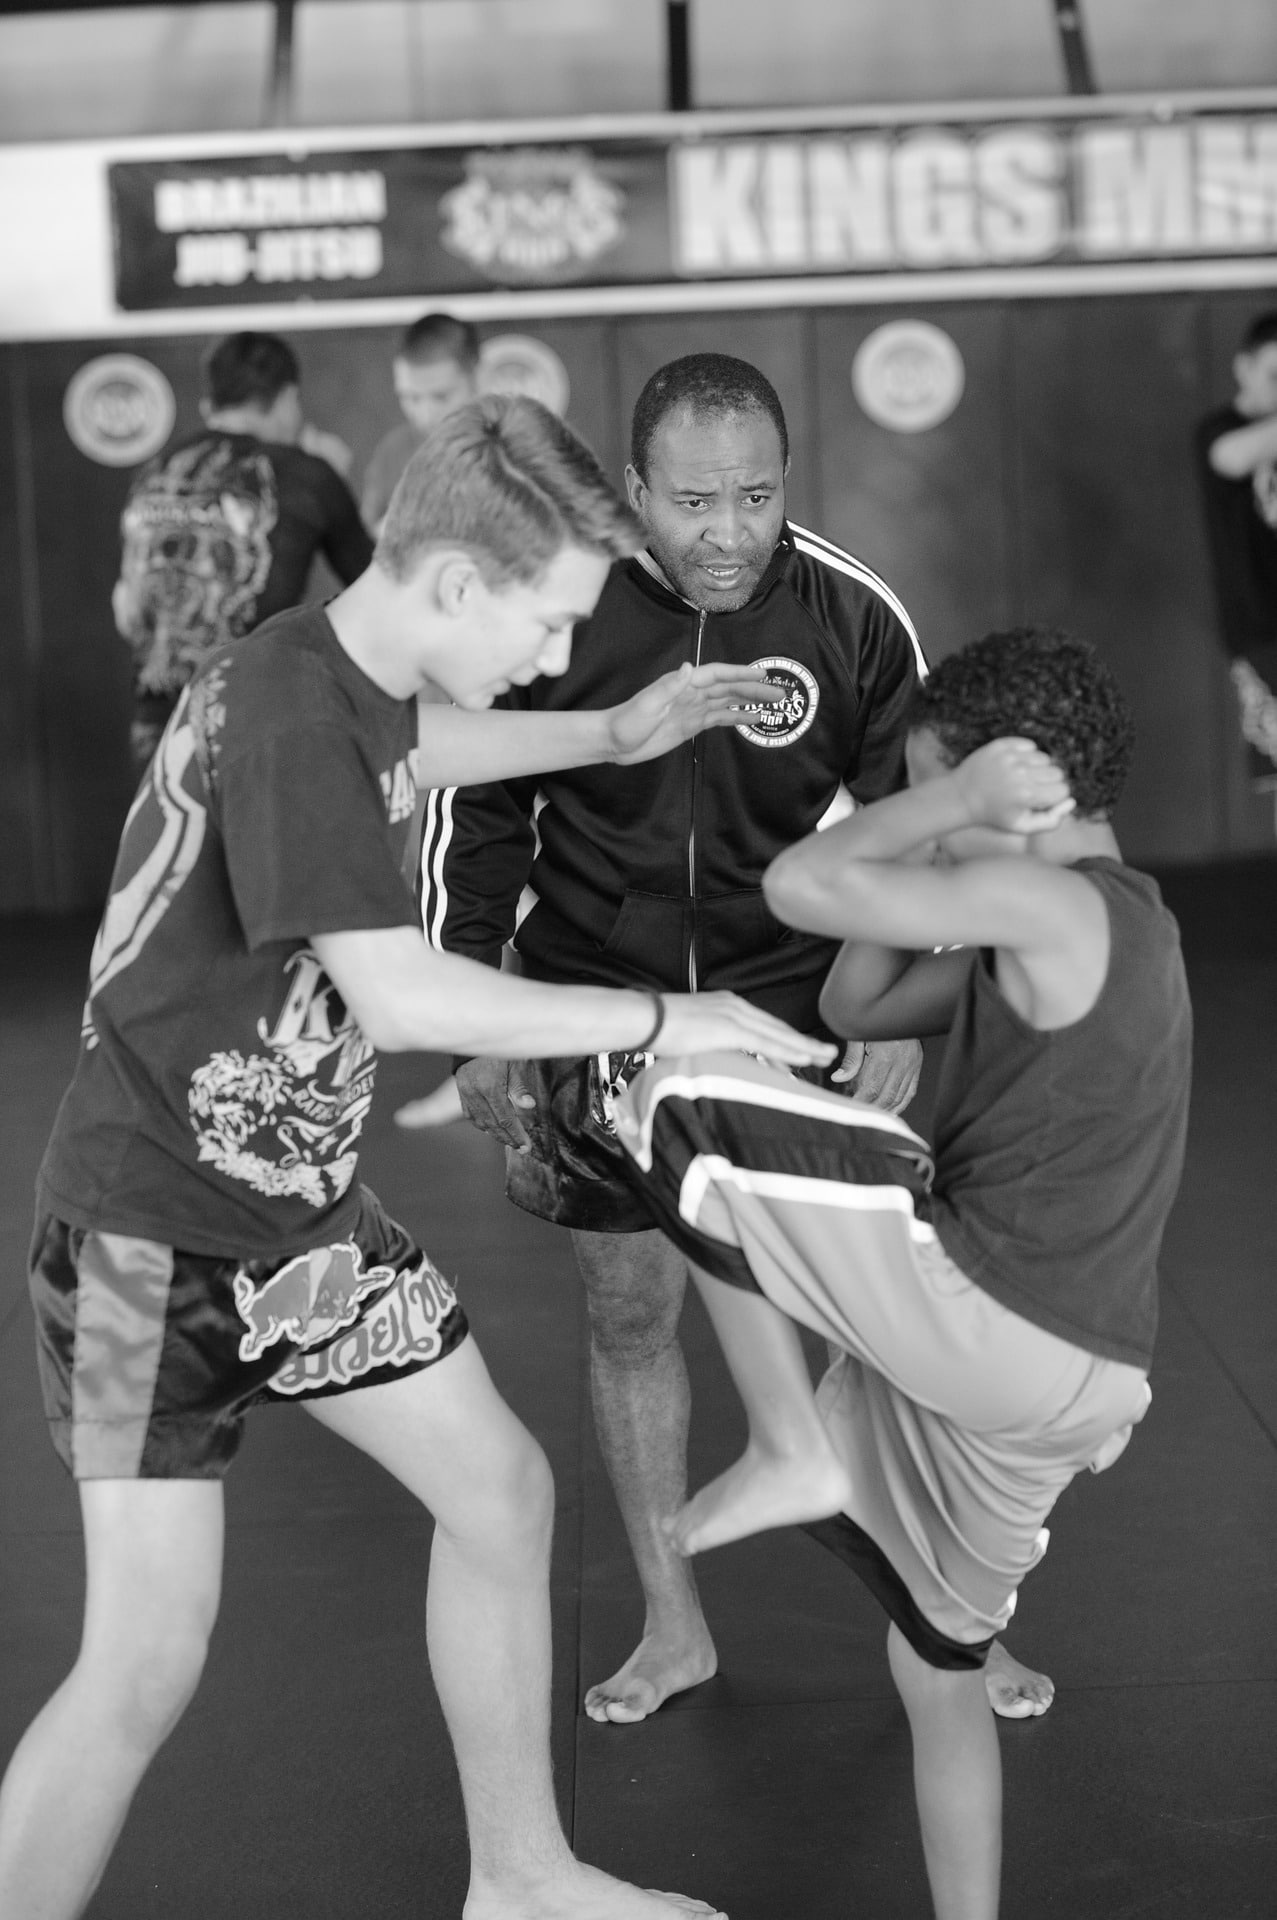 Blind Fury Jiu-Jitsu Academy Contact Us image